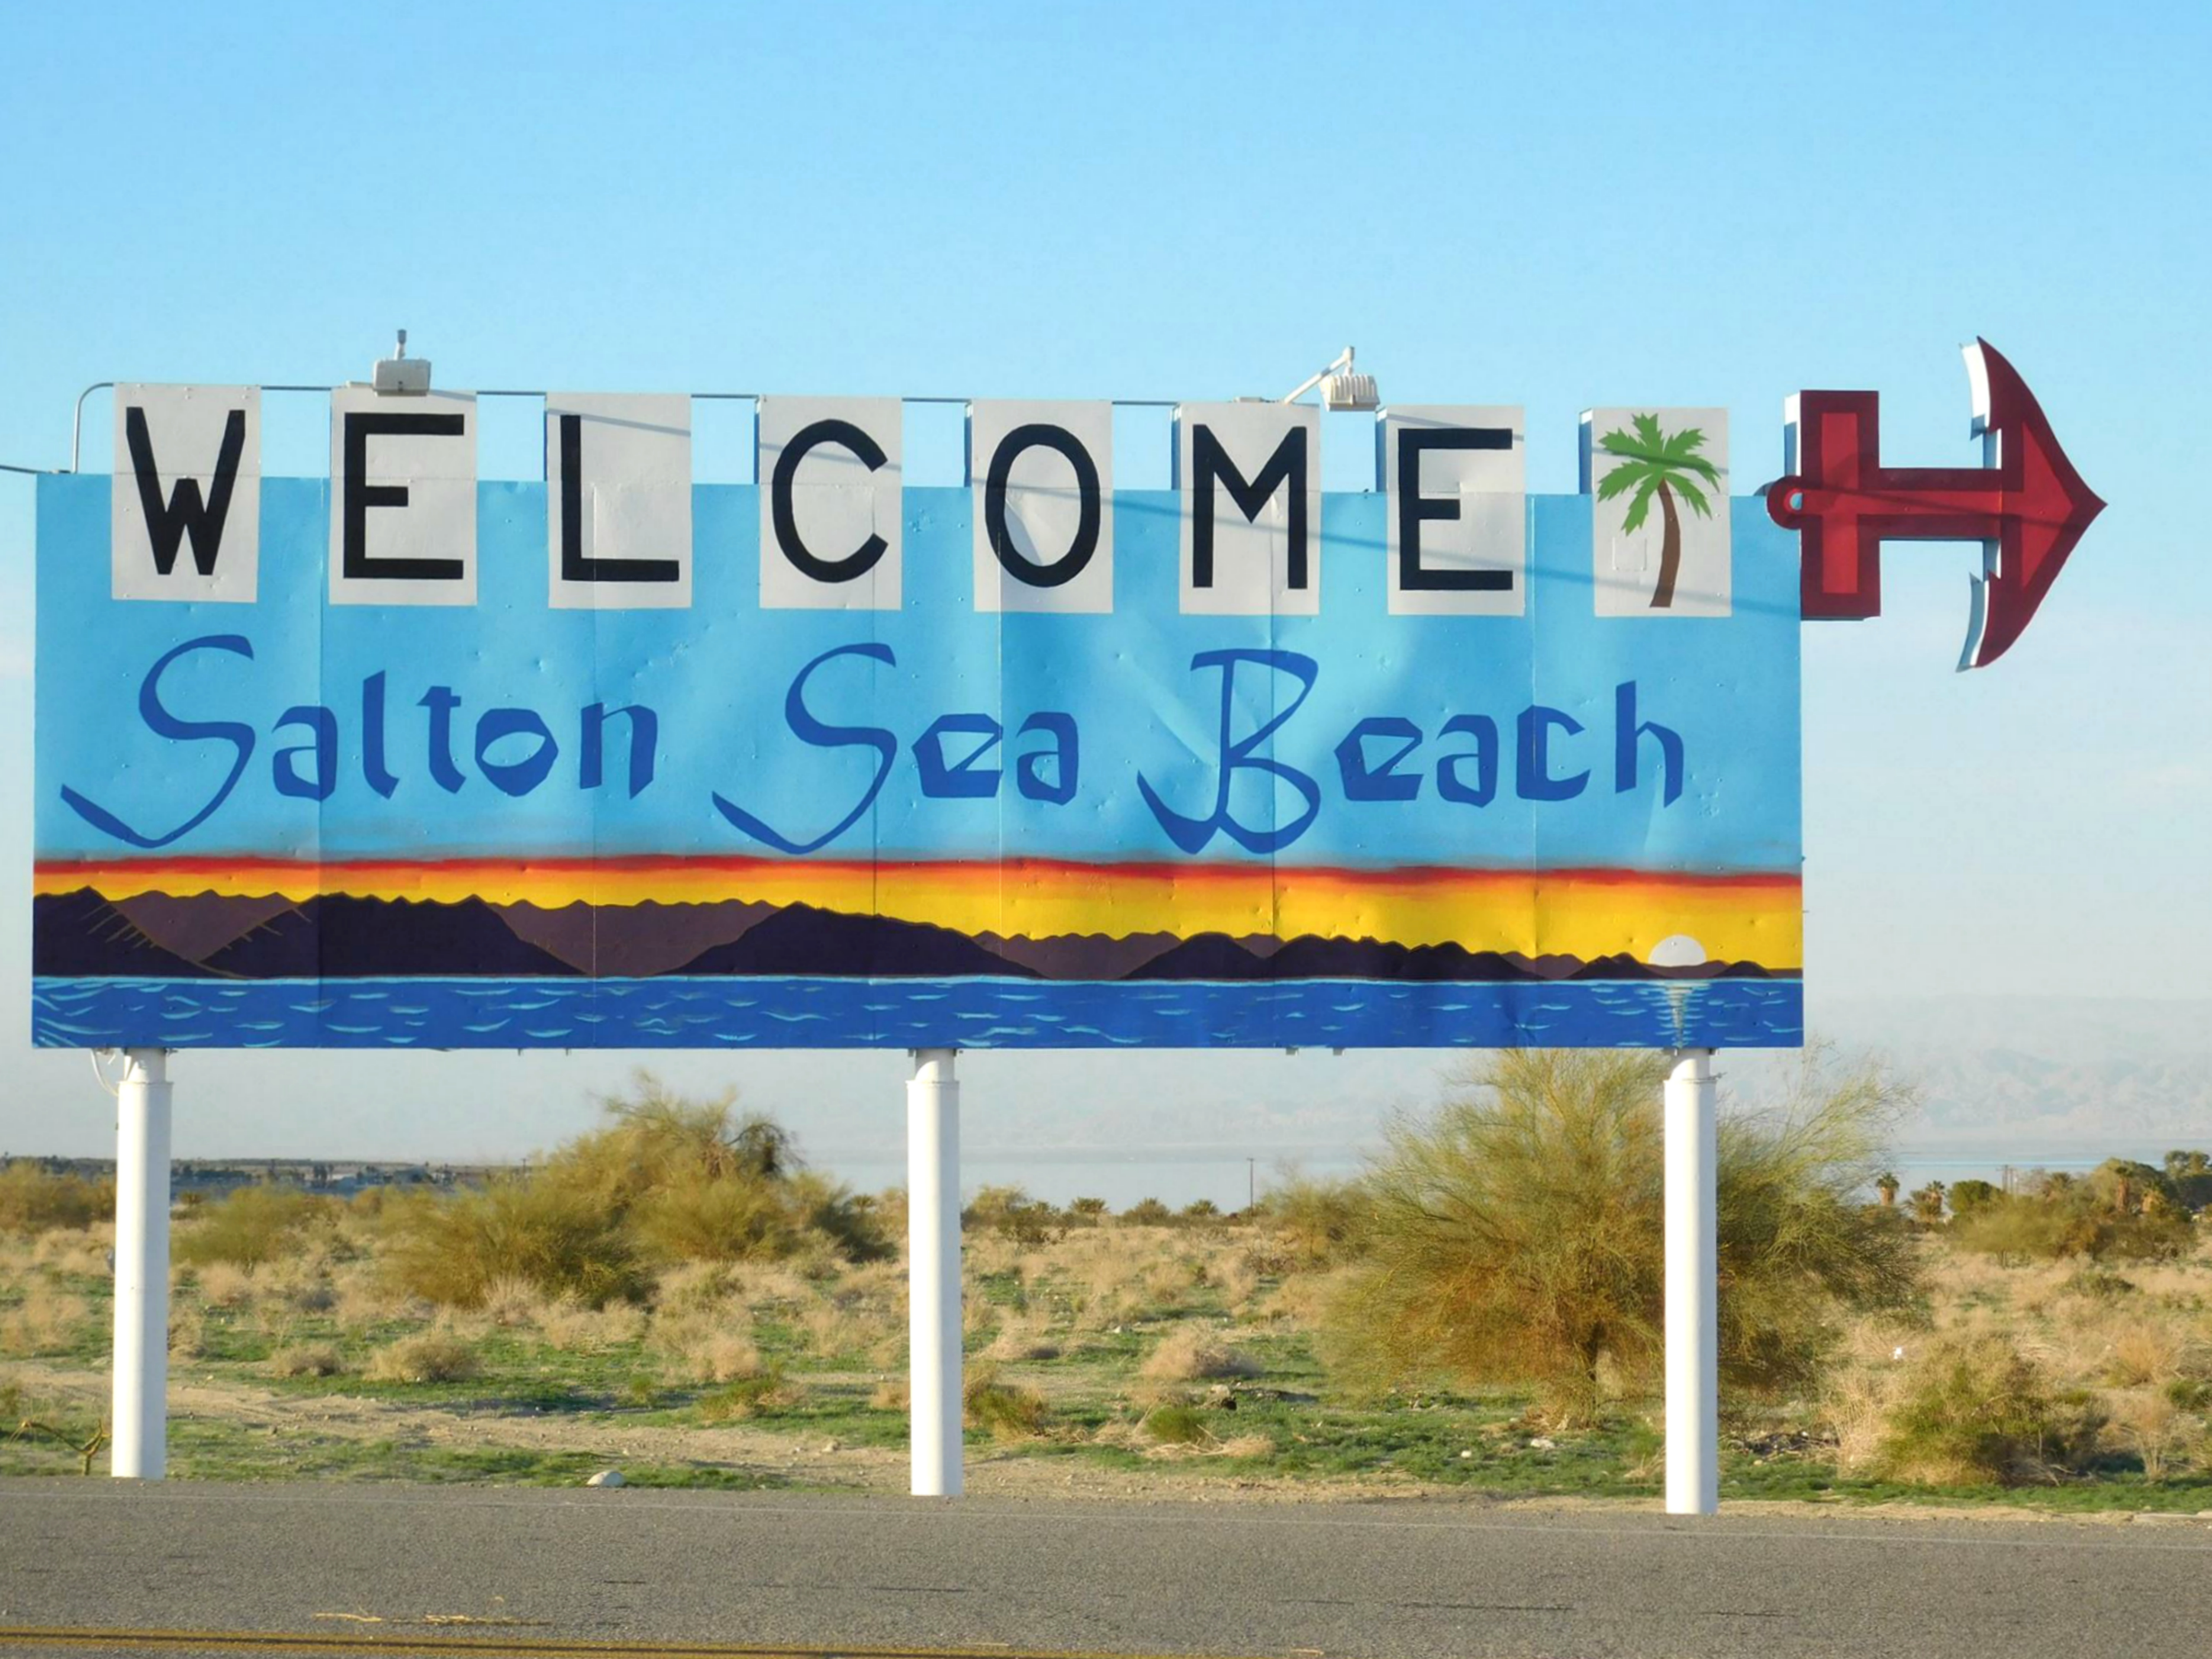 salton sea beach, california - wikipedia